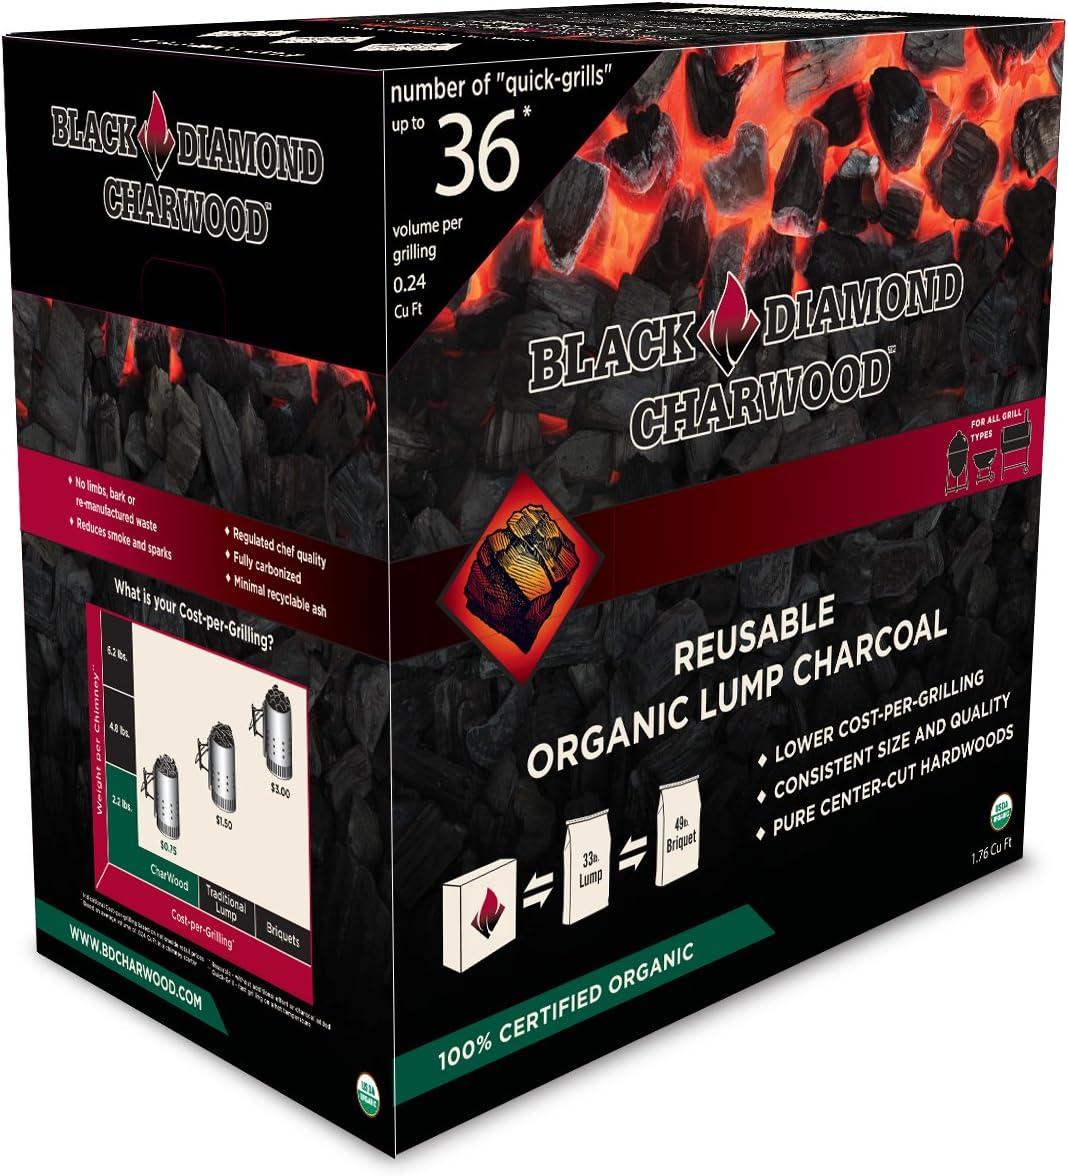 Under blast sales Black Dealing full price reduction Diamond CharWood BD176 Charcoal Box Lump Large